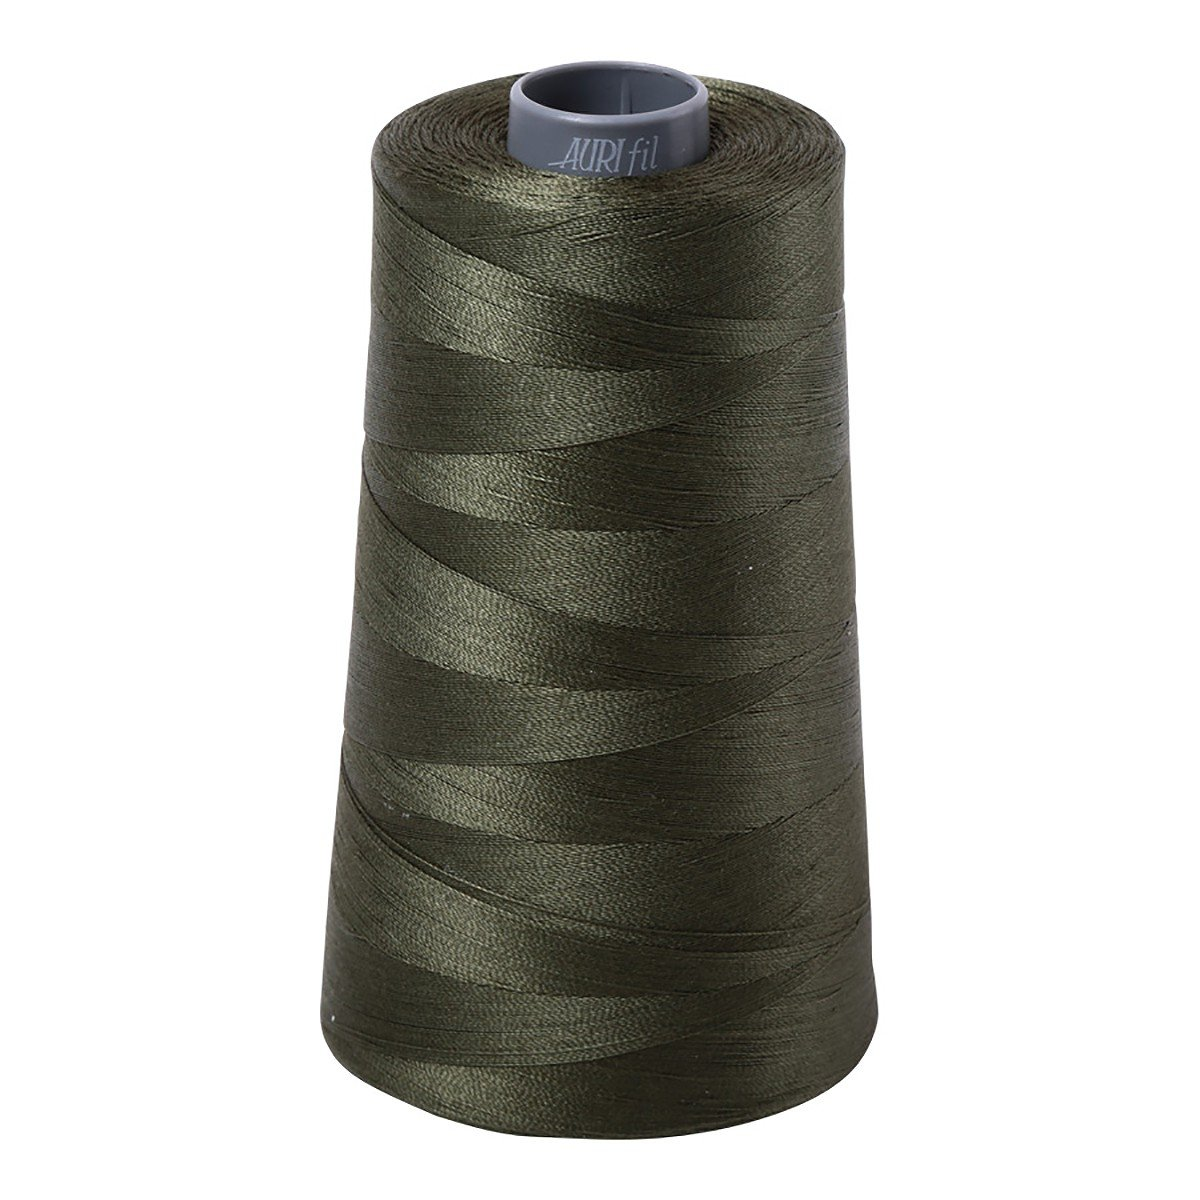 Mako (Cotton) Embroidery Thread 28wt 3609yds Dark Green